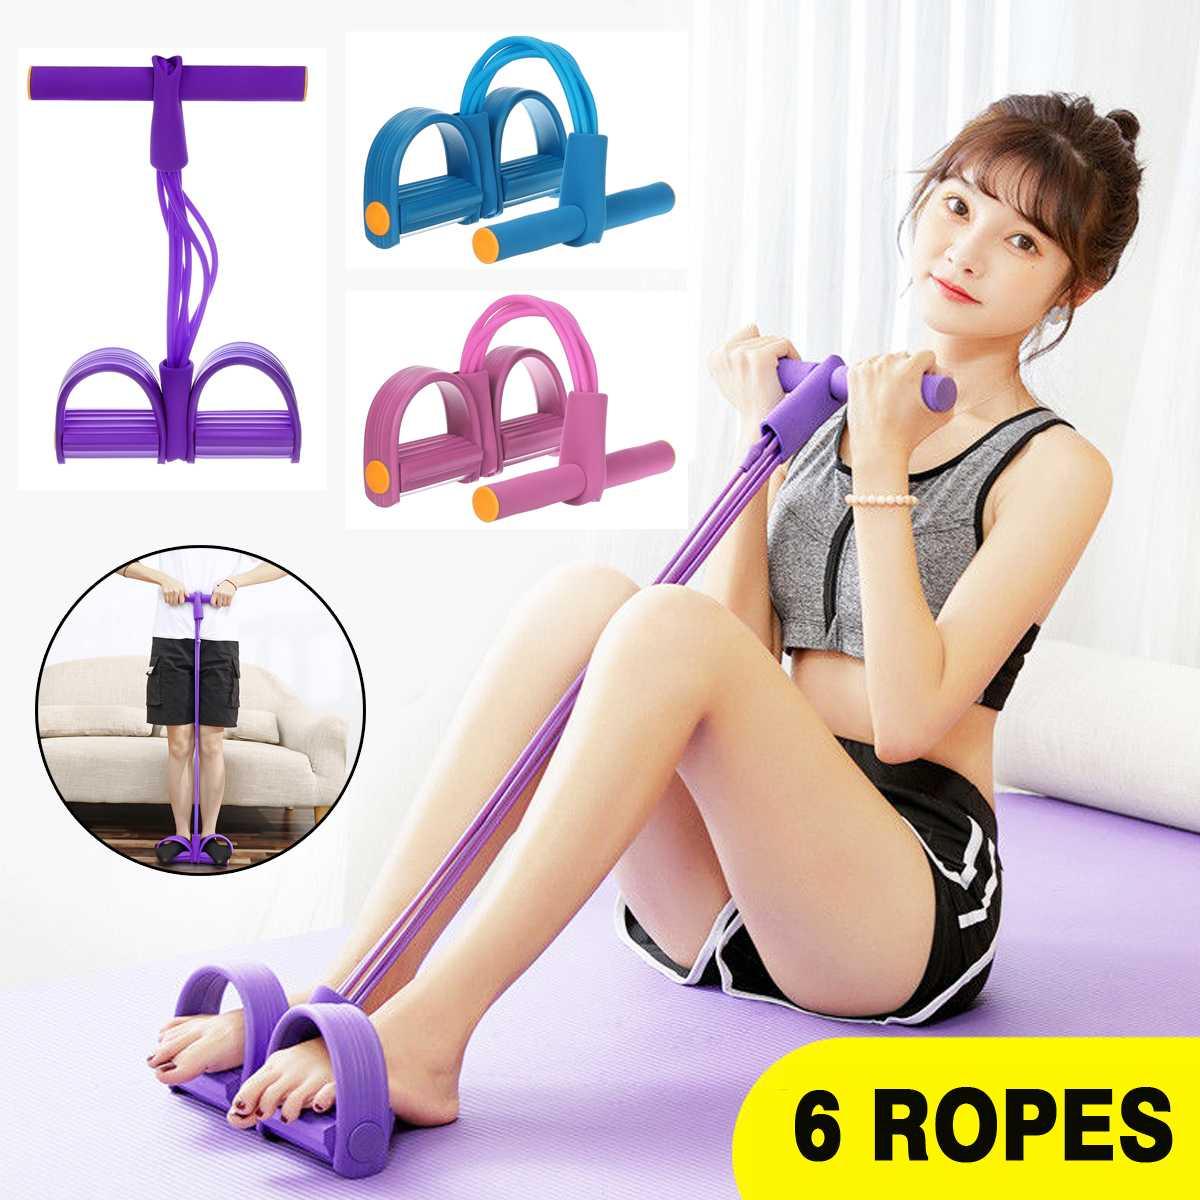 Fasce di corda di tensione multifunzione fasce di resistenza per esercizi elastici nastro fasce di resistenza Fitness 6 tubi elastici